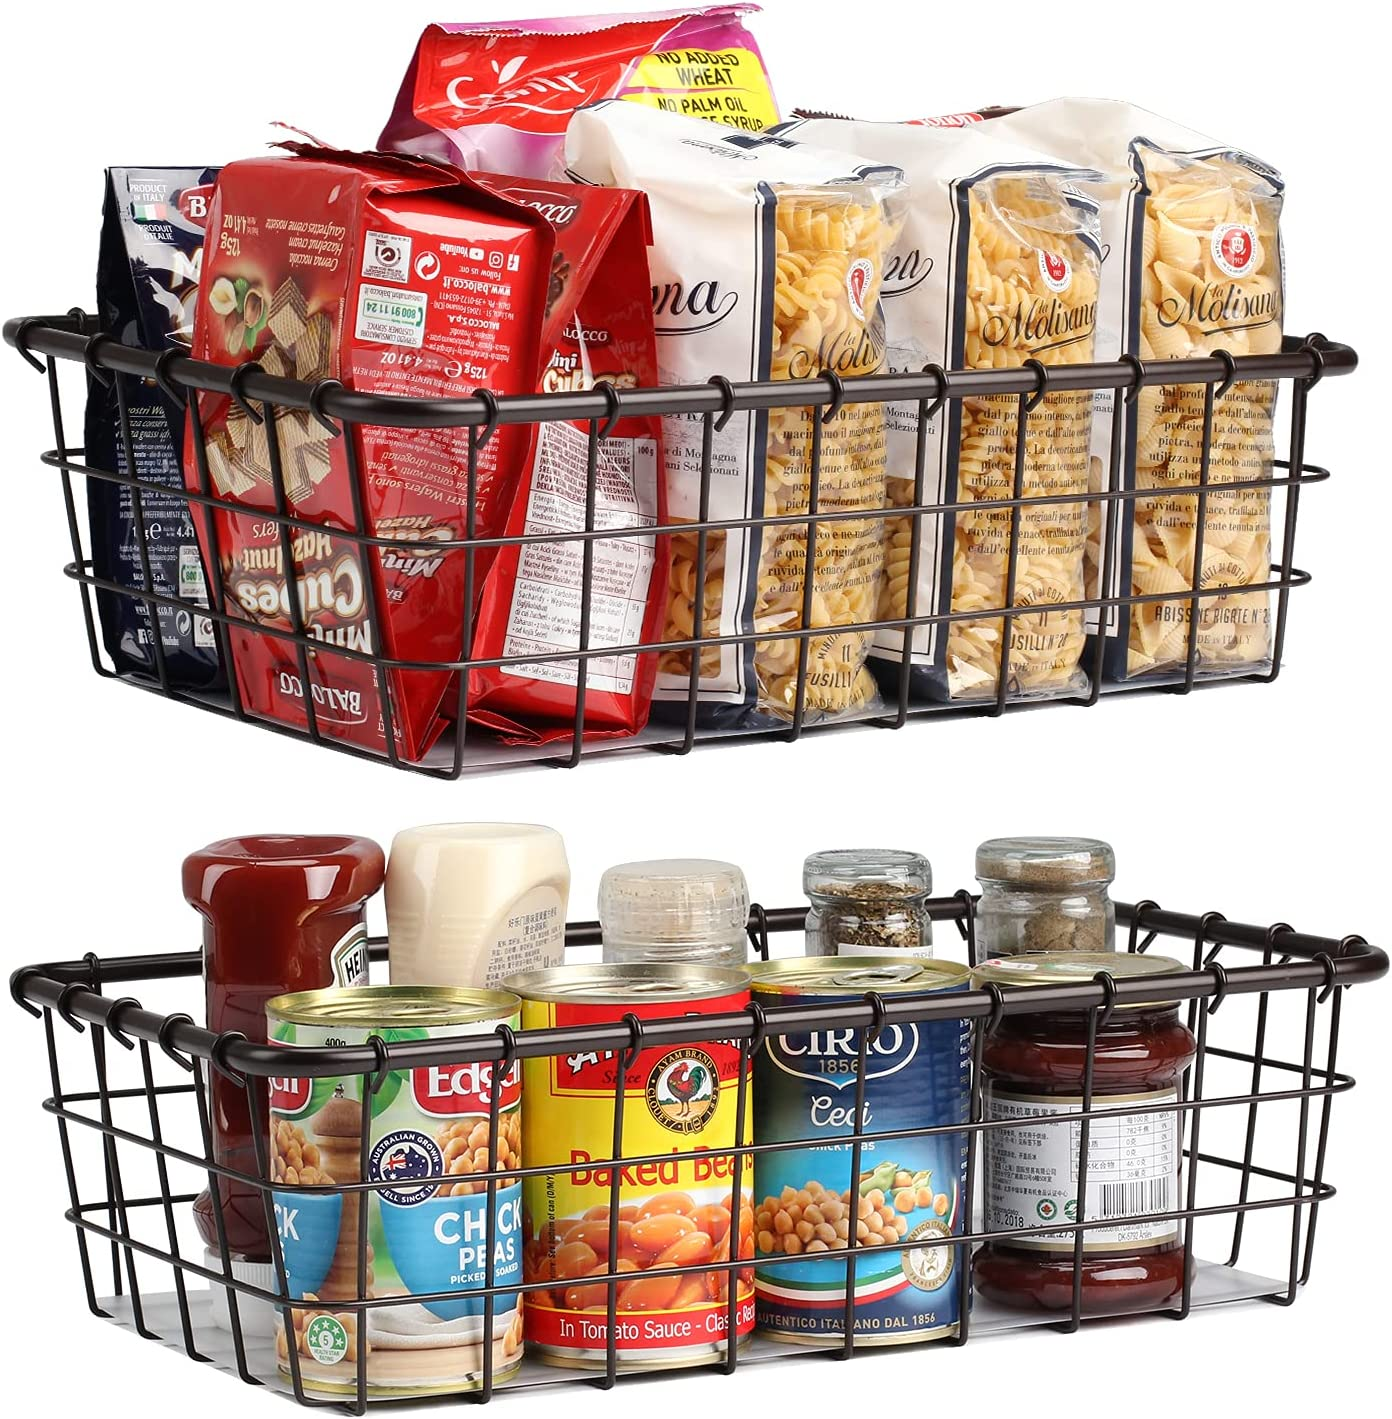 Wire Baskets for Storage Pantry 2 Pack Produce Vegetable Basket Farmhouse Food Organizer Bins for Kitchen Bathroom Freezer Cabinet Shelves-Bronze